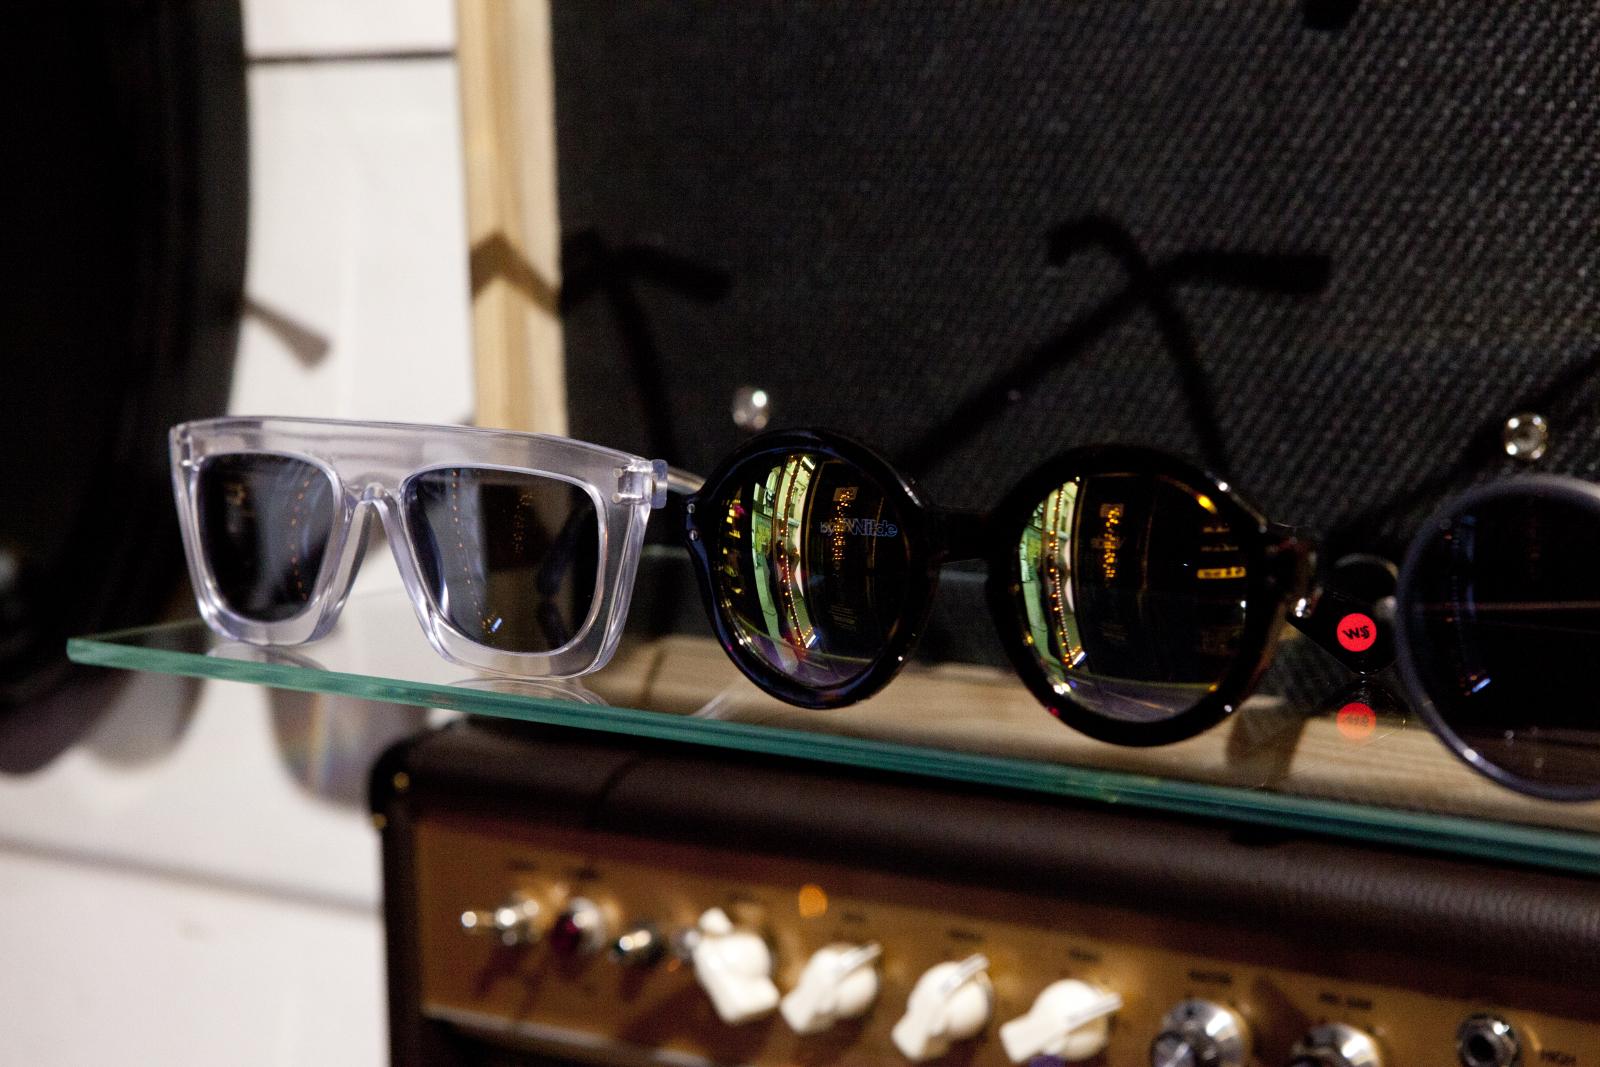 Robert_Adalierd_Rob_Design_Furniture_Wilde_sunglasses15.jpg